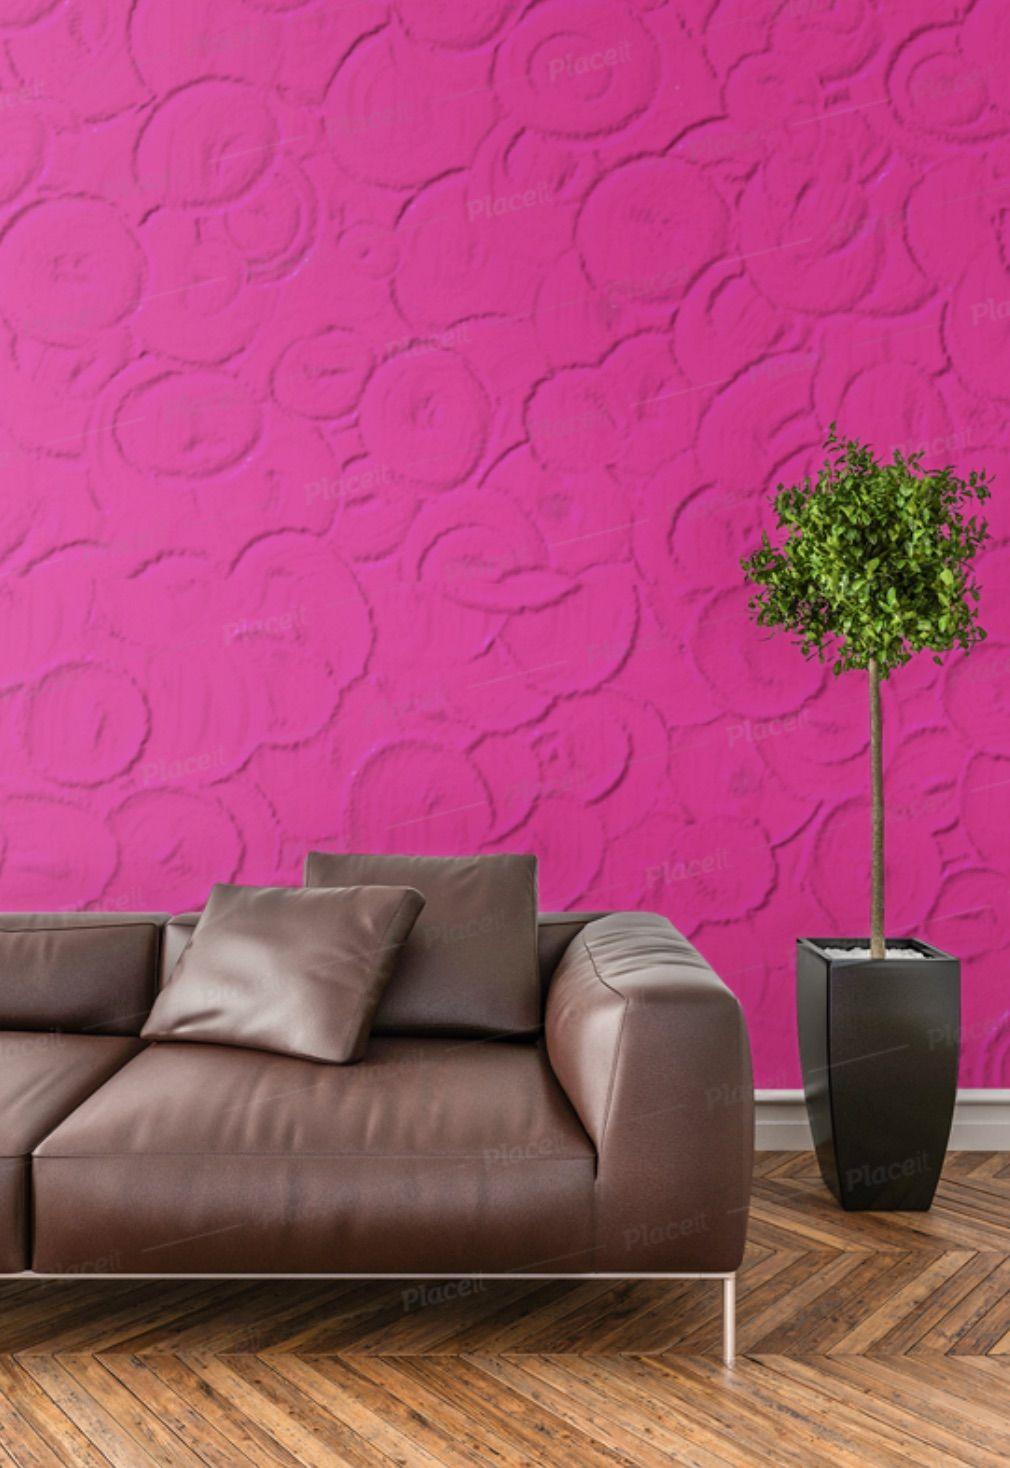 Retro Texture In 2020 Asian Paint Design Textured Wallpaper Asian Paints